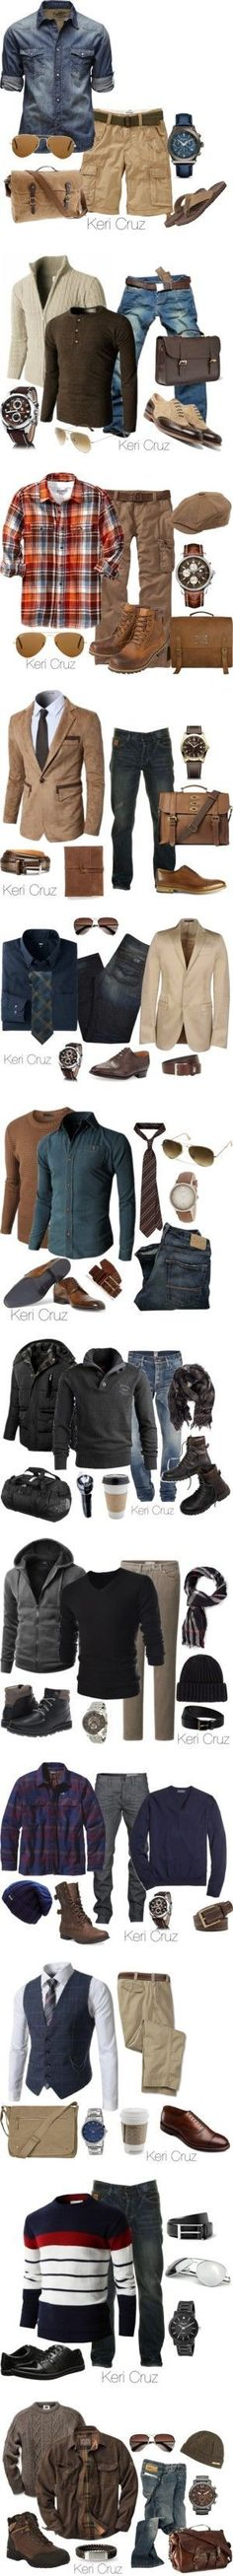 Men's Fashion Sets by Keri Cruz by keri-cruz on Polyvore featuring Old Navy, Jack & Jones, Salvatore Ferragamo, Ray-Ban, J.Crew, Kenneth Cole Reaction, Doublju, Cerruti 1881, Mulberry and 73